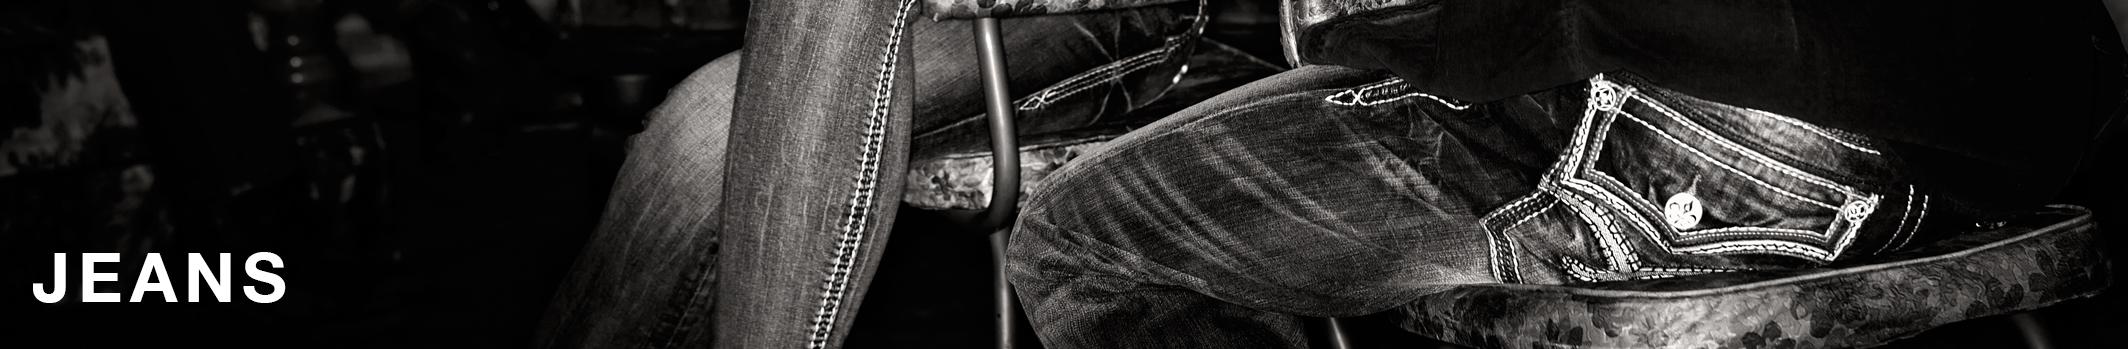 mens-jeans-26.jpg